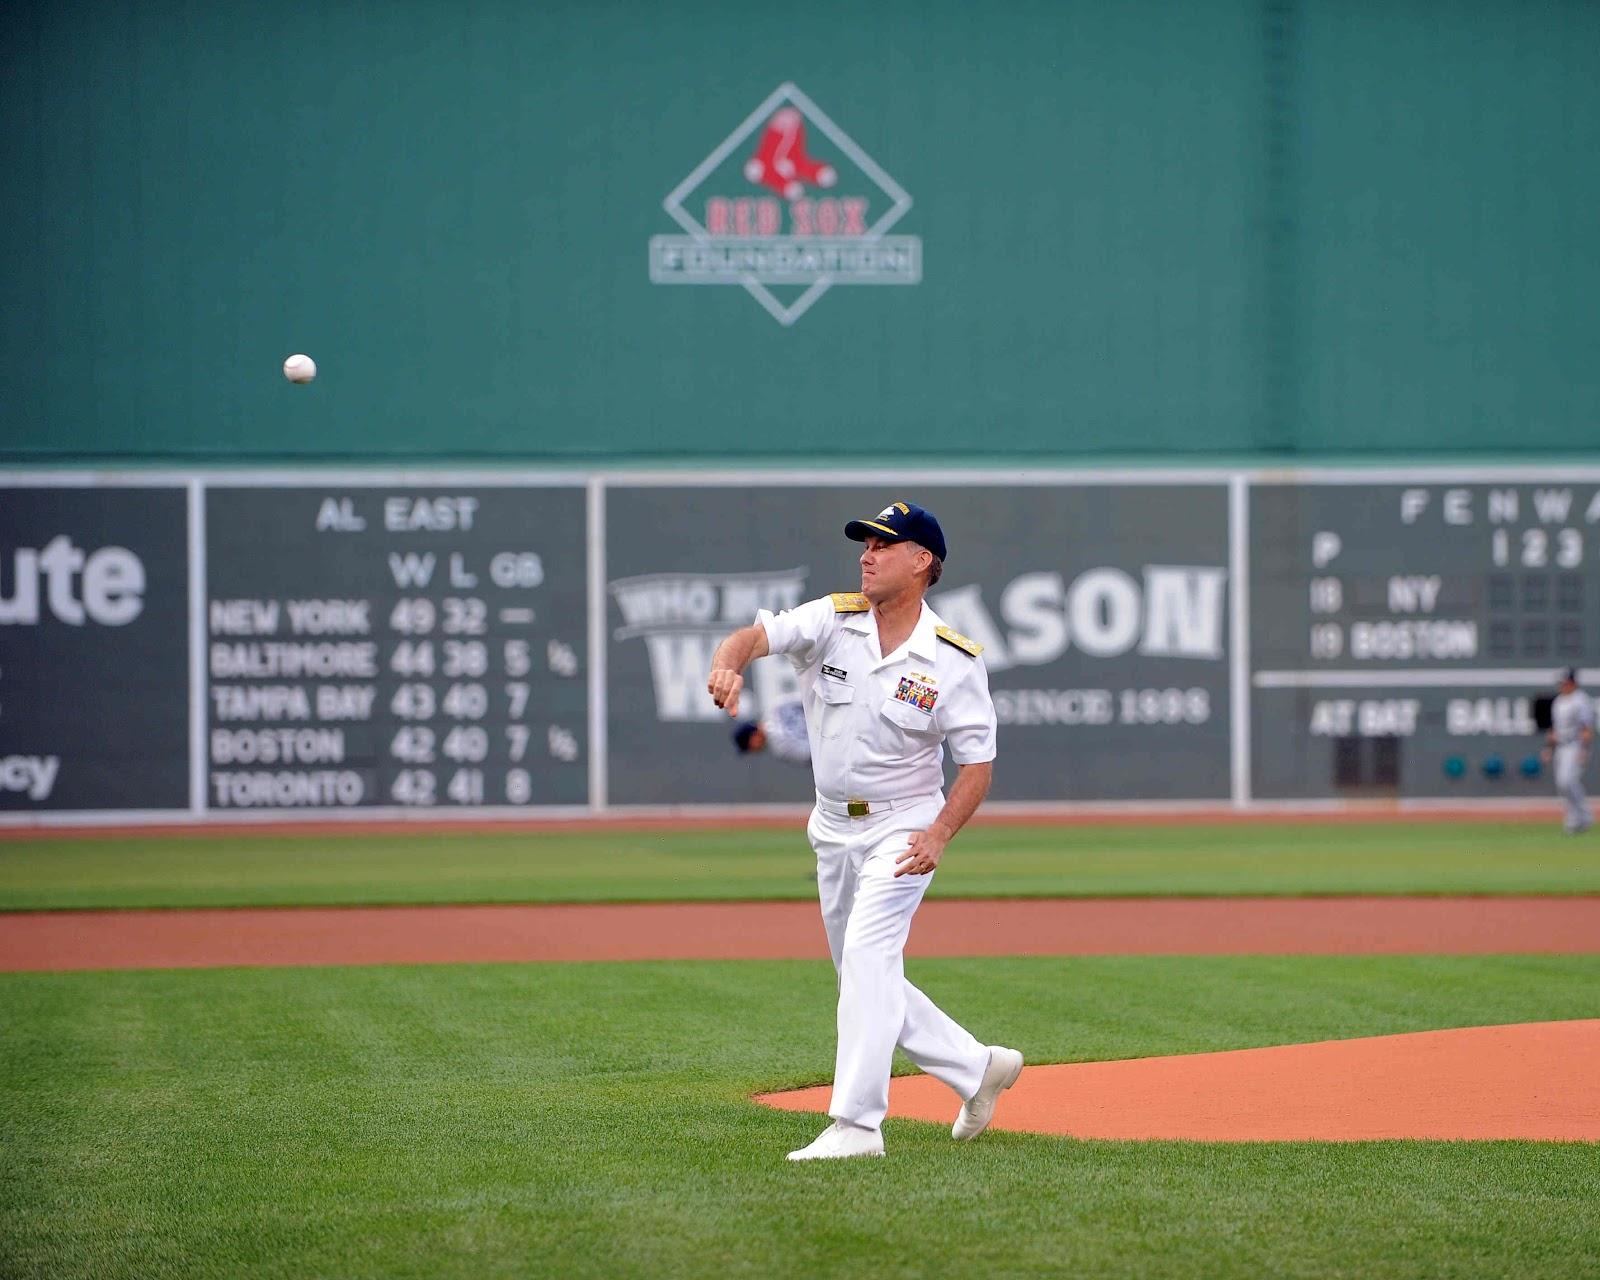 http://3.bp.blogspot.com/-EmSEZ7ziIeI/T_lzHasHVTI/AAAAAAAAGrc/wLjzWHbEjU0/s1600/BOSTON+RED+SOXU.S.+Navy+photo+courtesy+of+the+Boston+Red+Sox+by+Amanda++120706-N-ZZ999-001.jpg